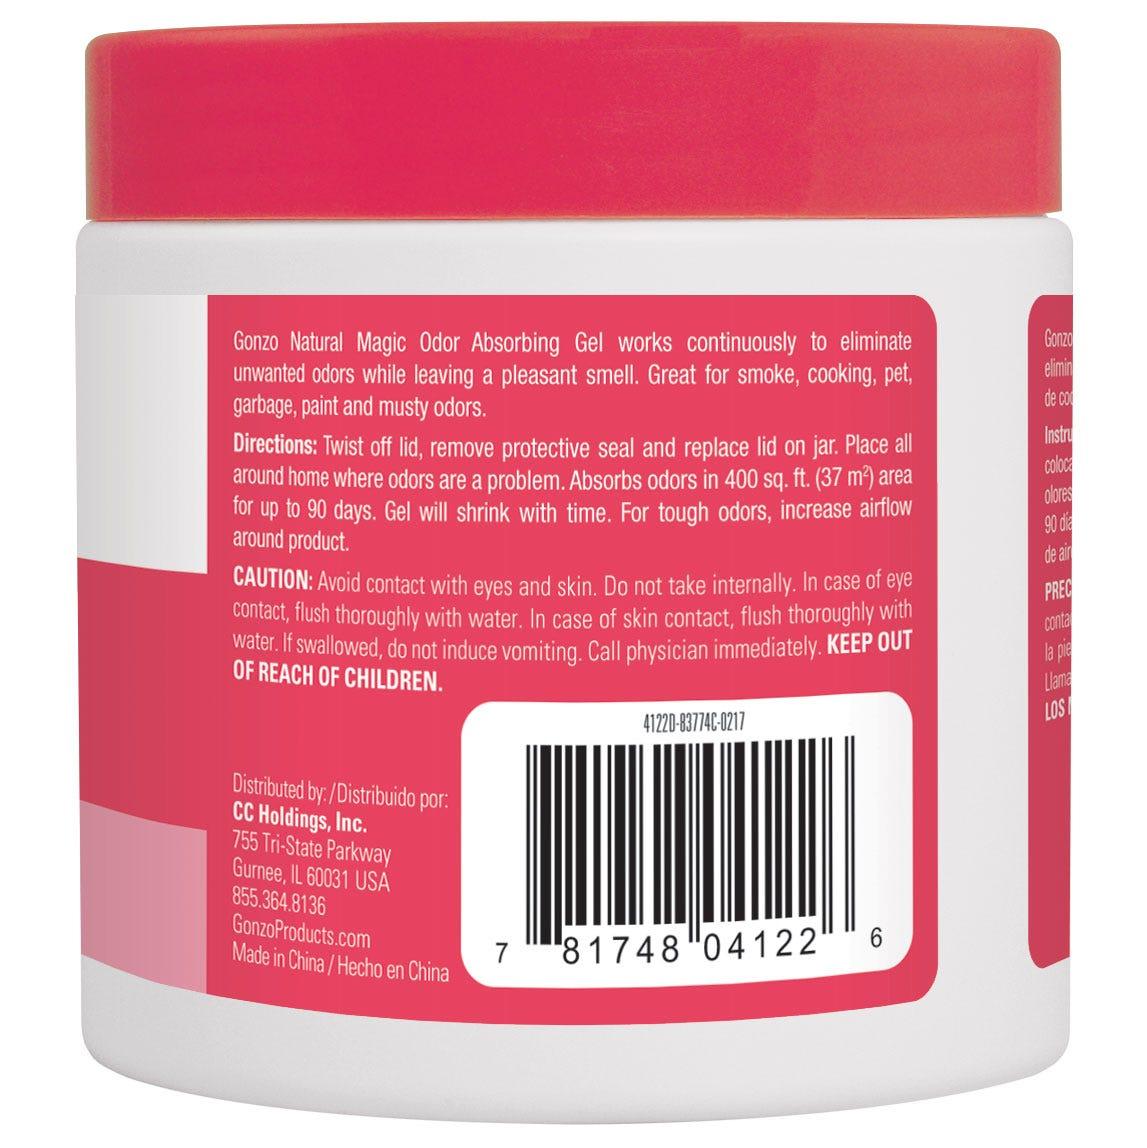 https://googone.com/media/catalog/product/t/r/tropical-odor-absorber_back.jpg